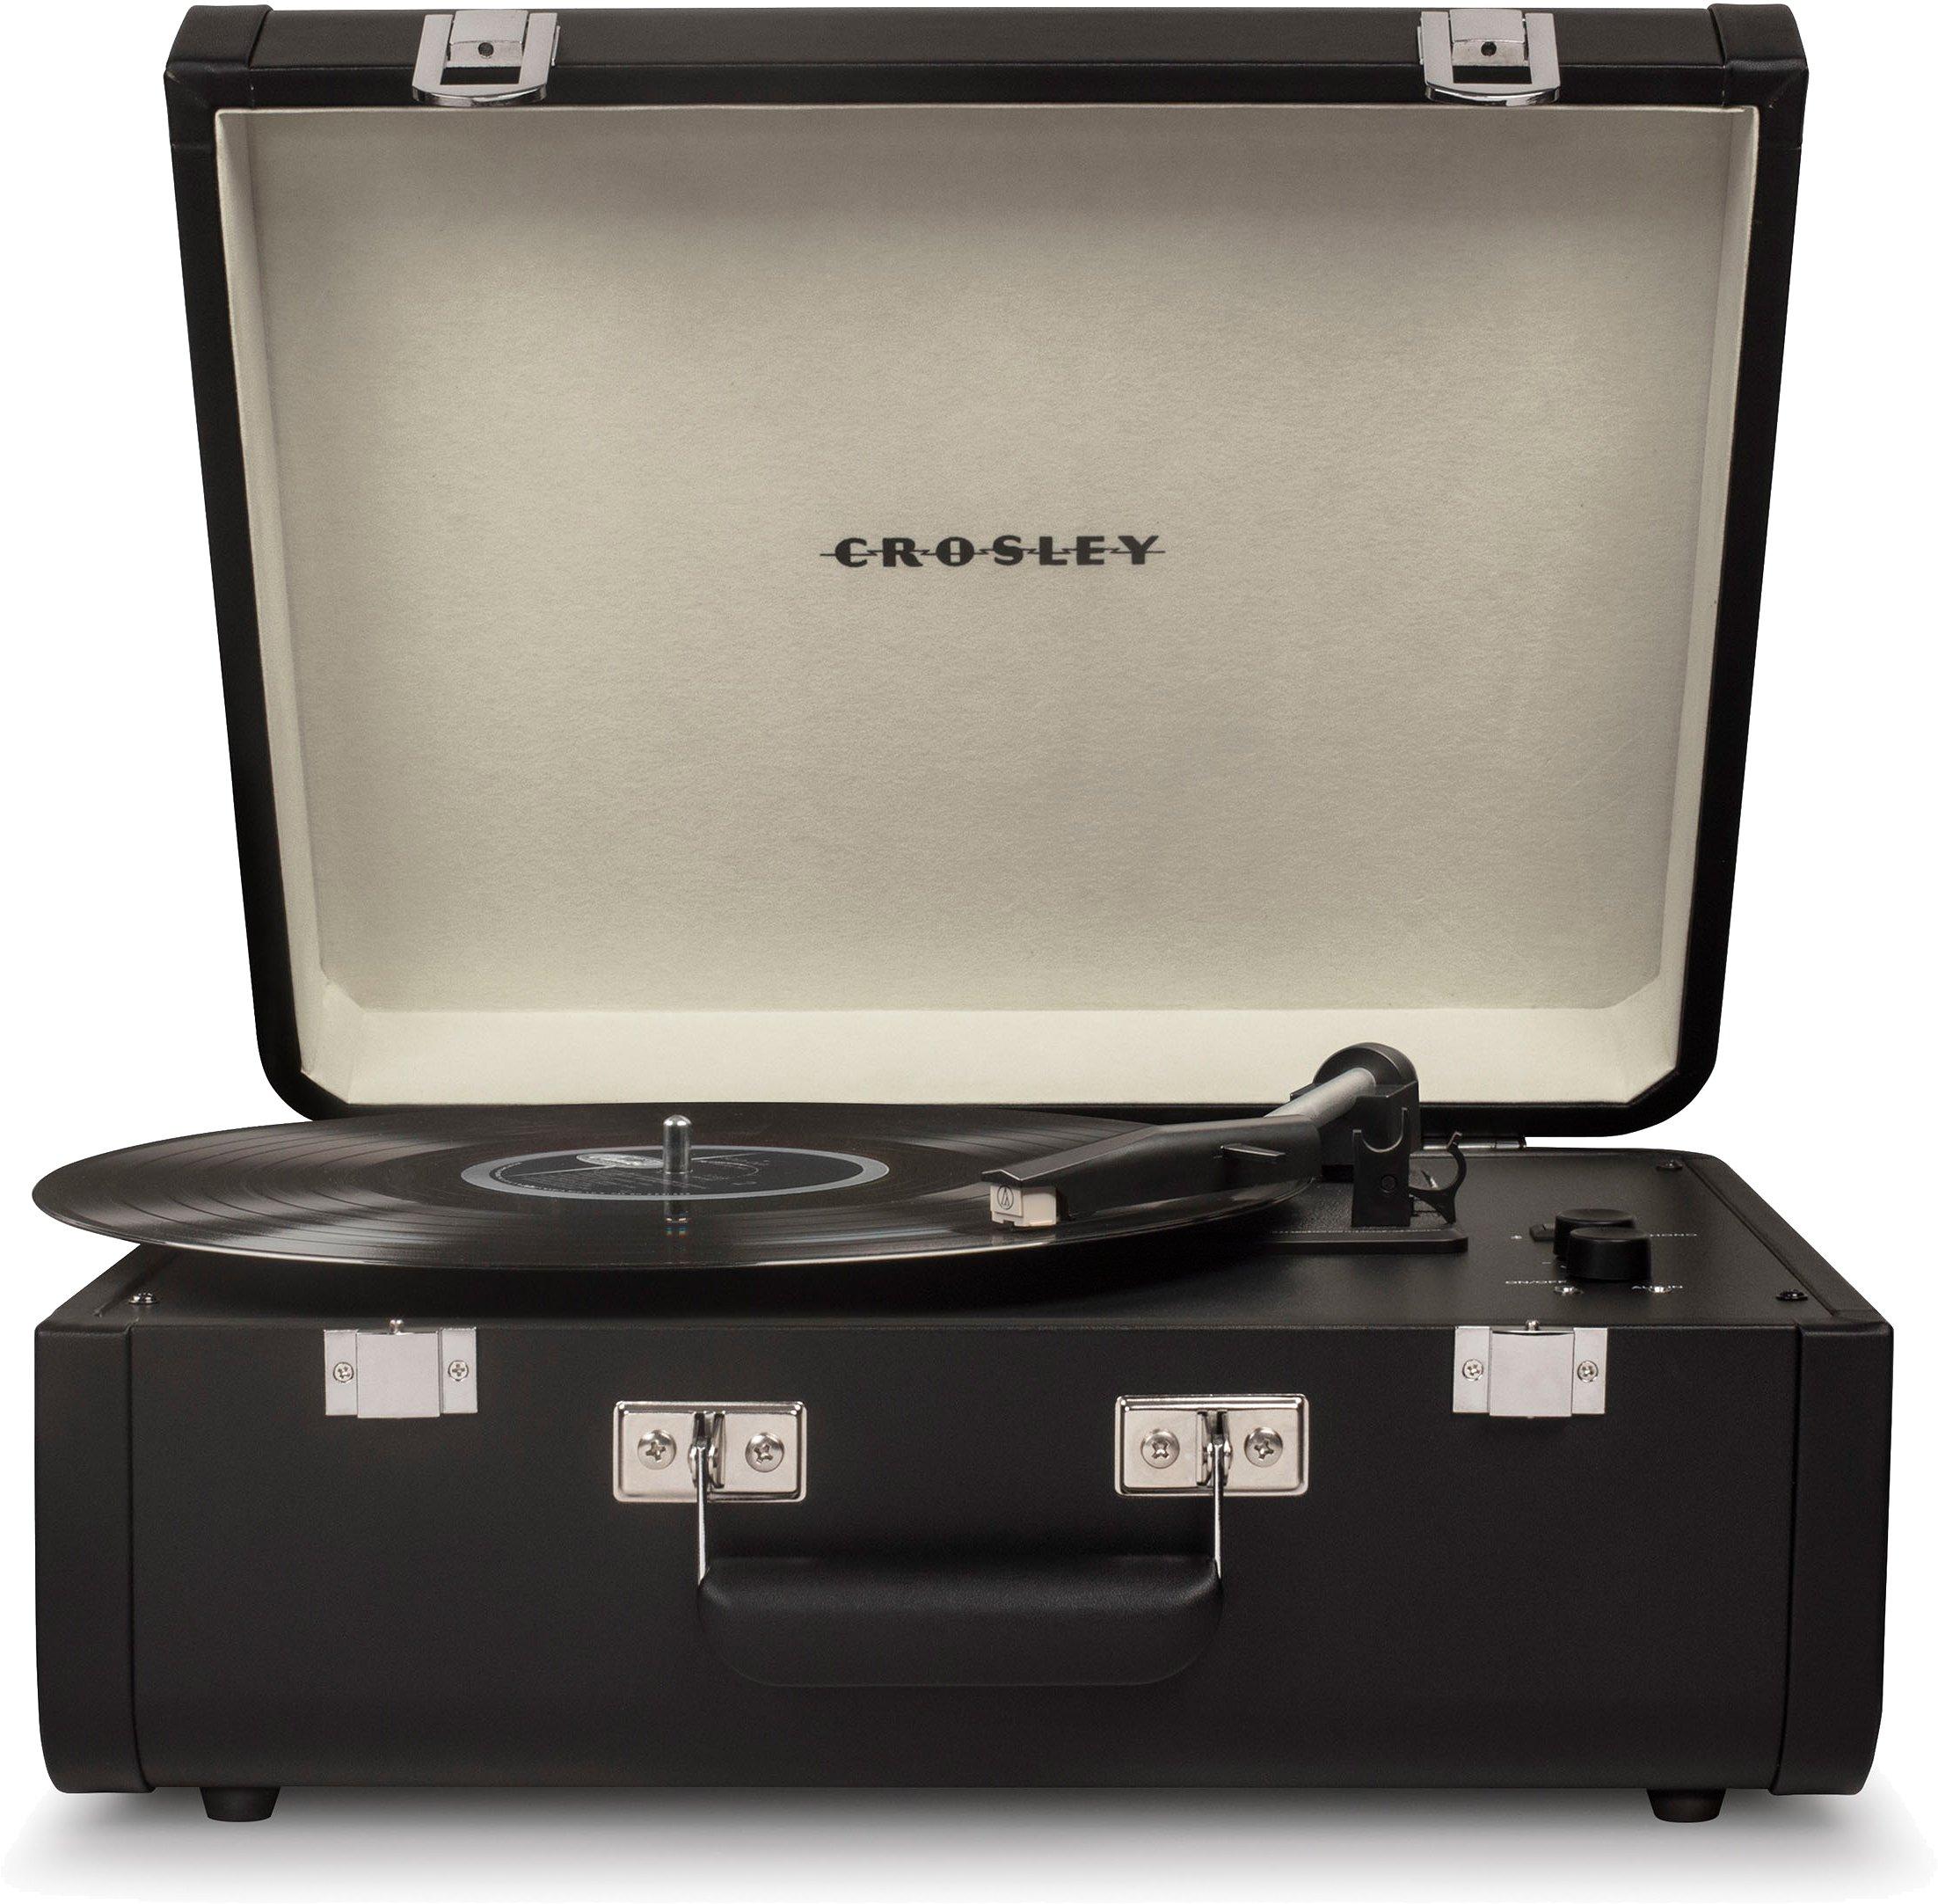 Crosley CR6252A-BK Portfolio Portable Turntable with Bluetooth, Black by Crosley